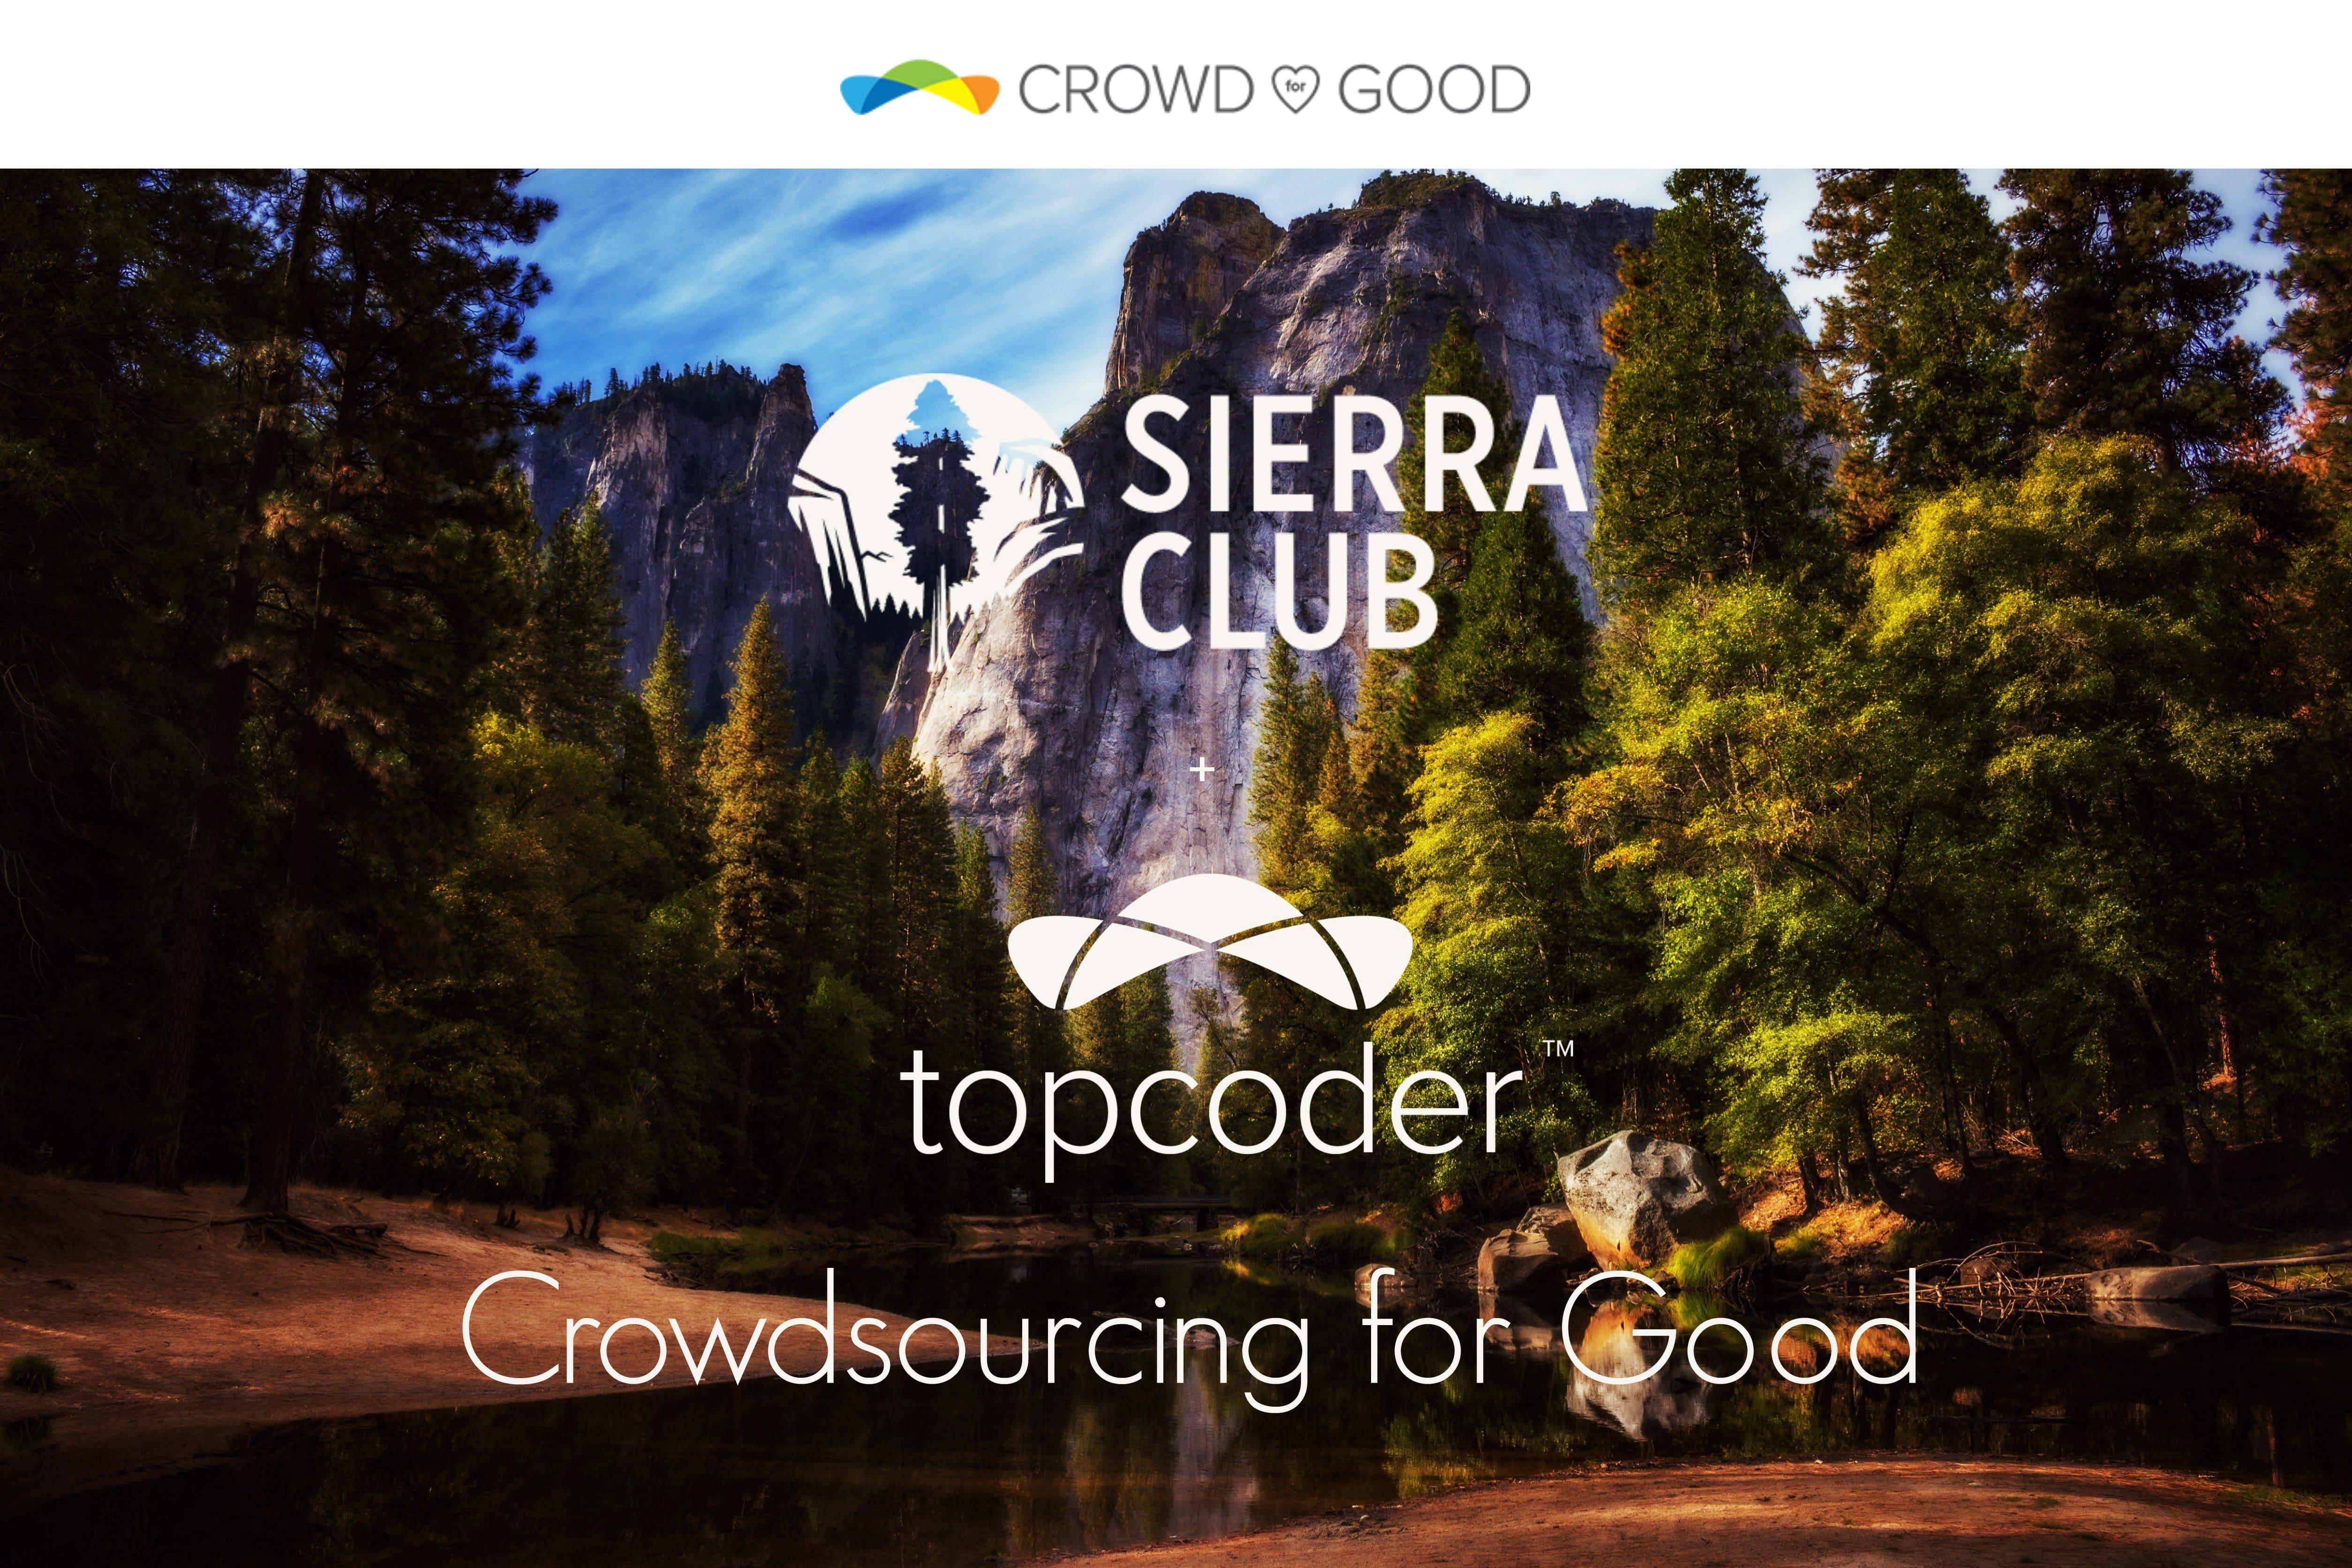 Sierra_Club_Crowd_For_Good_Blog_header-min